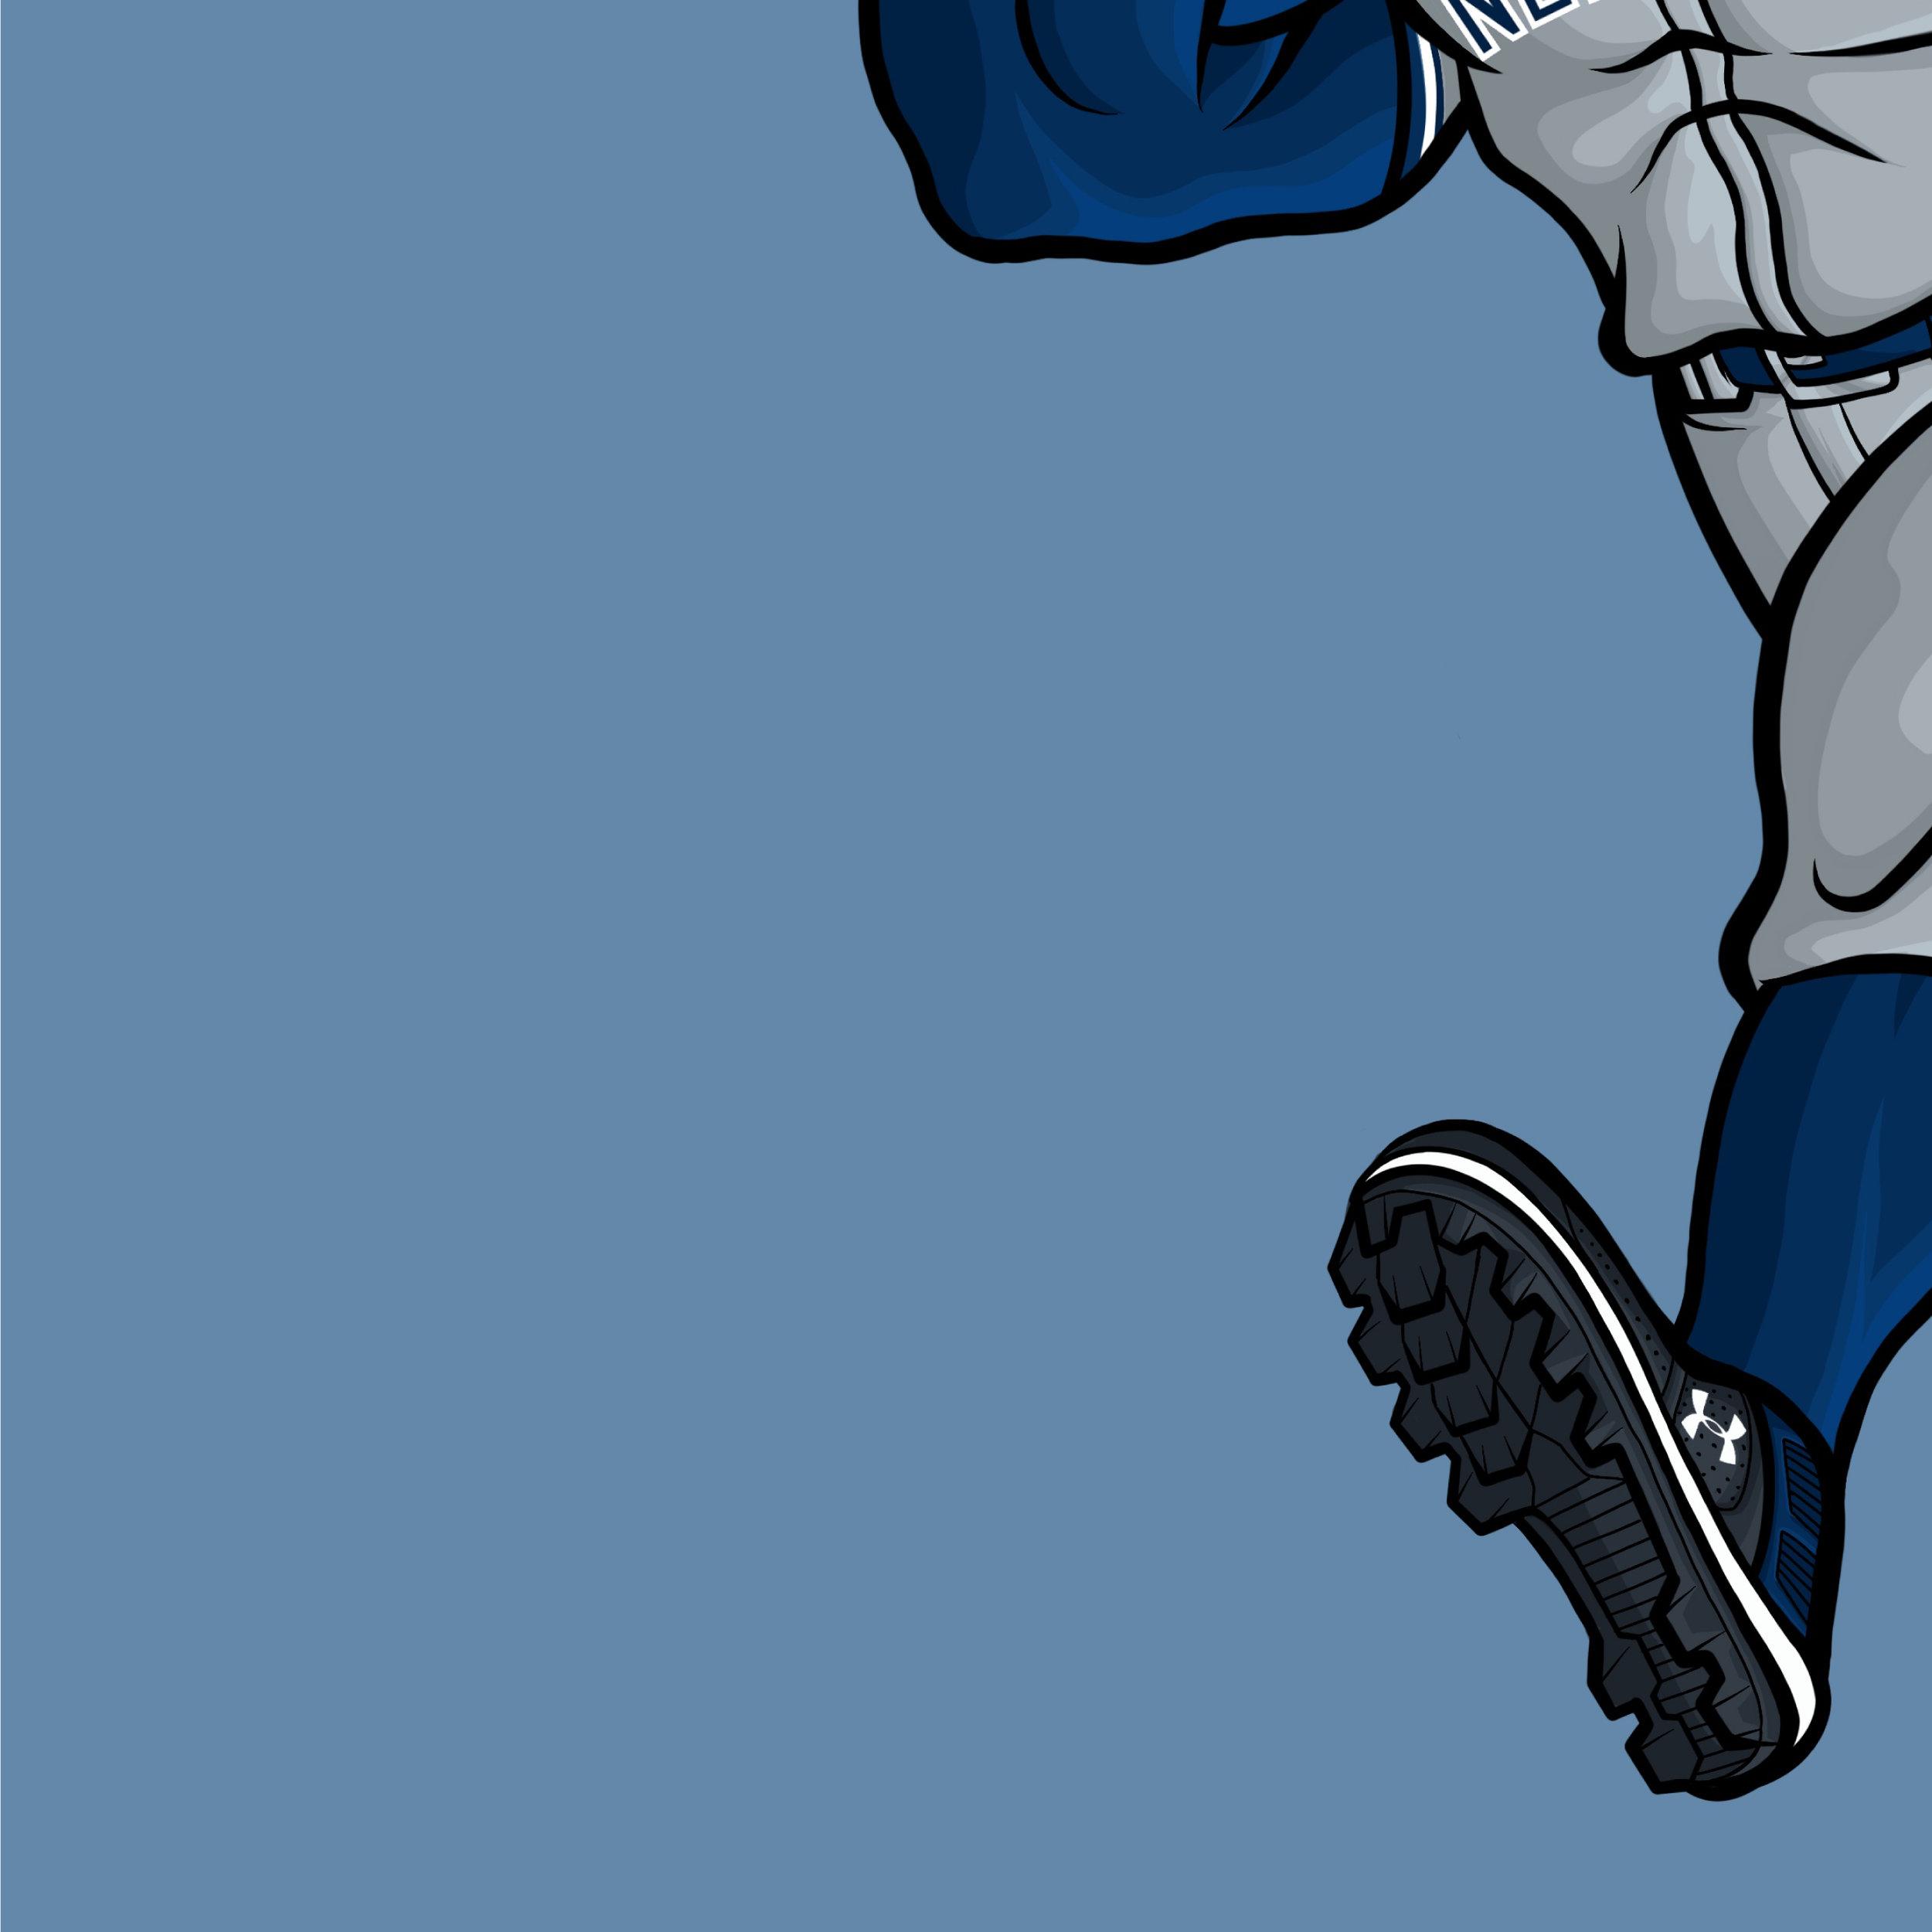 mlb-yankee-slugger-illustration-3.jpg